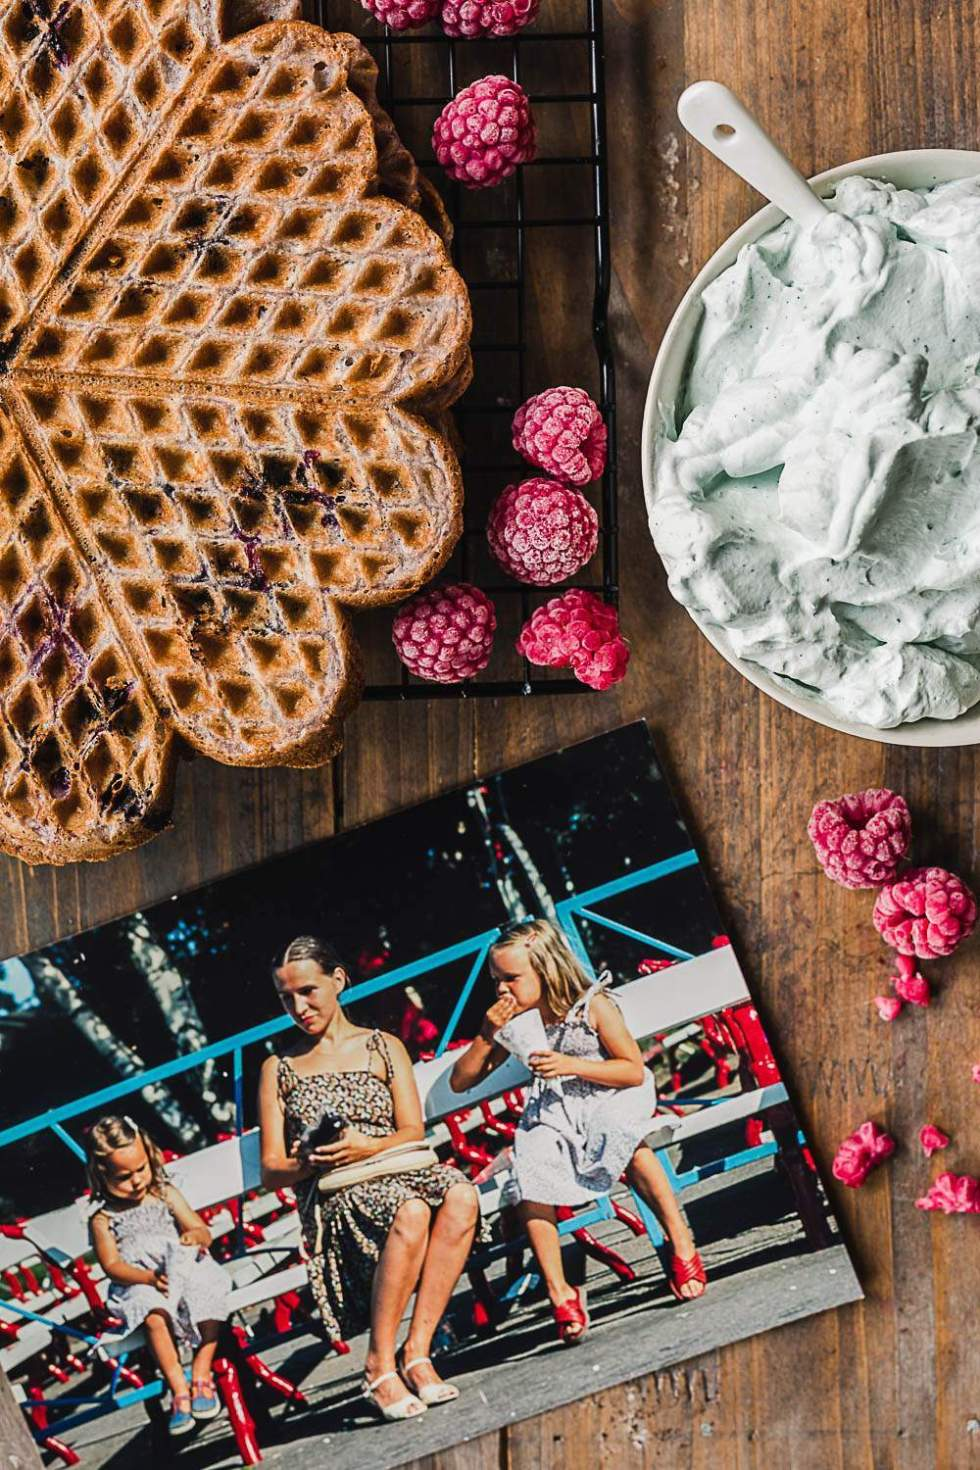 Blueberry cardamom waffles